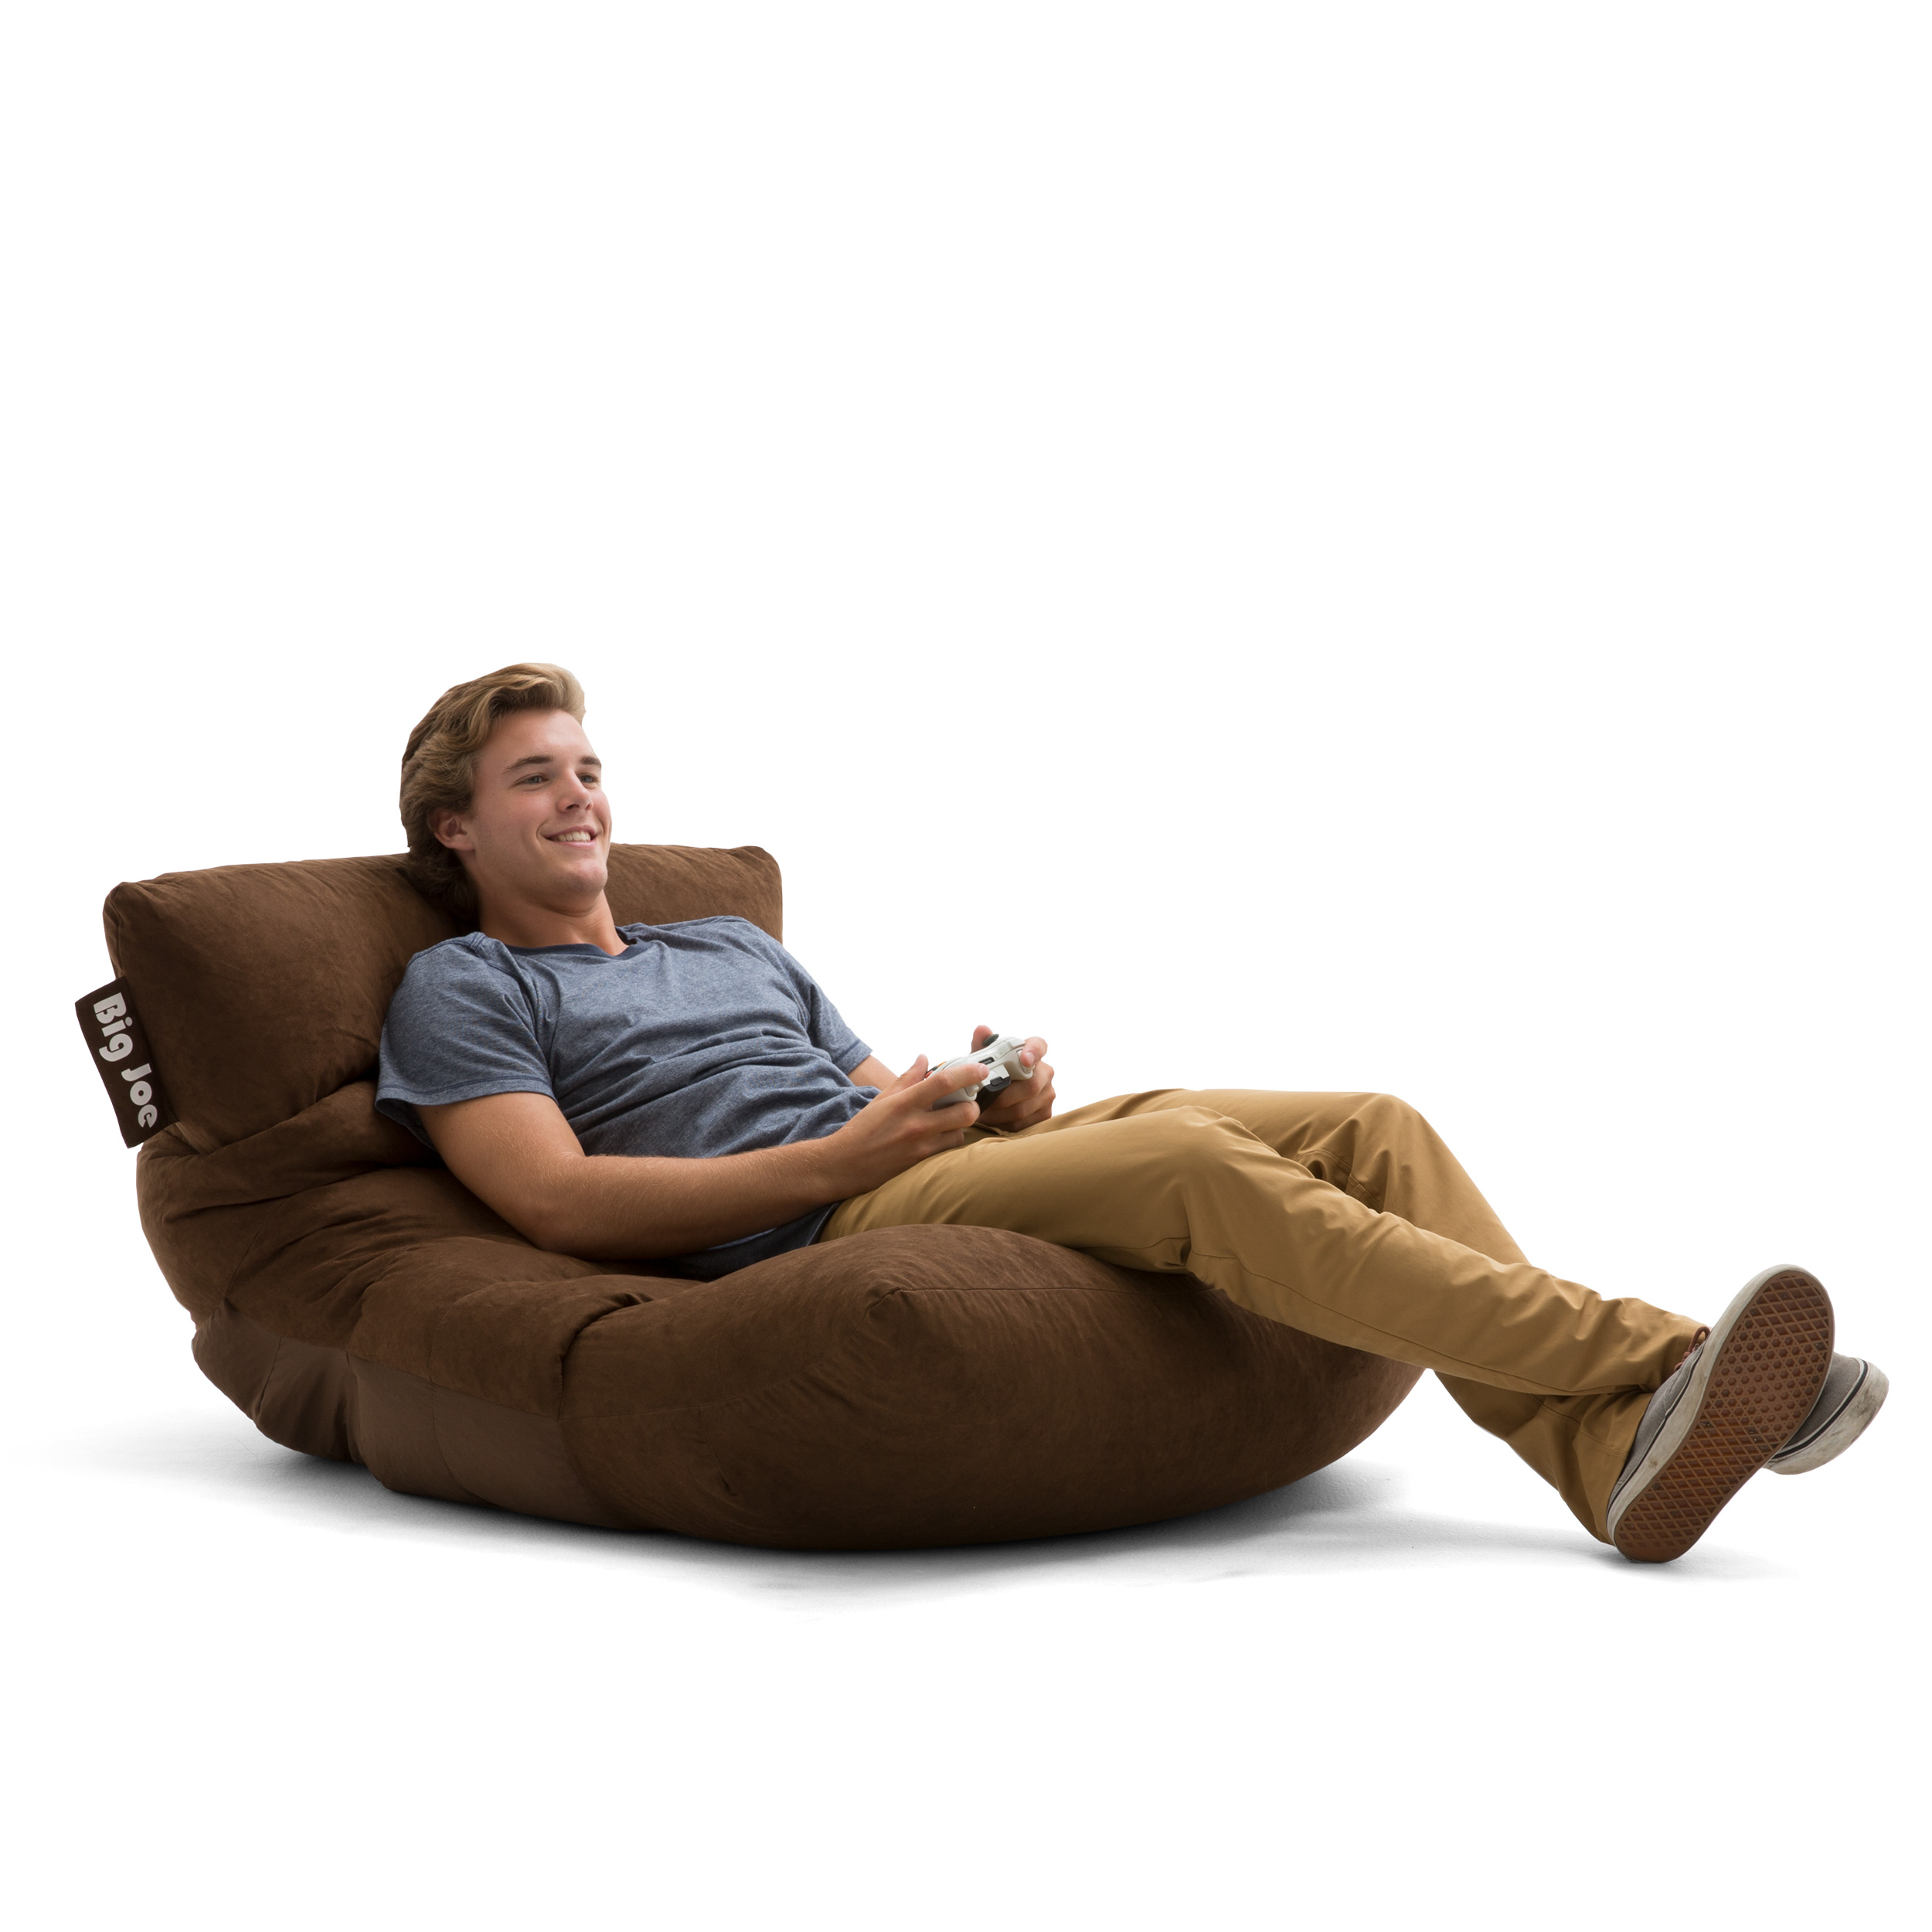 Groovy Big Joe Roma Floor Bean Bag Chair Multiple Colors Fabrics Pabps2019 Chair Design Images Pabps2019Com